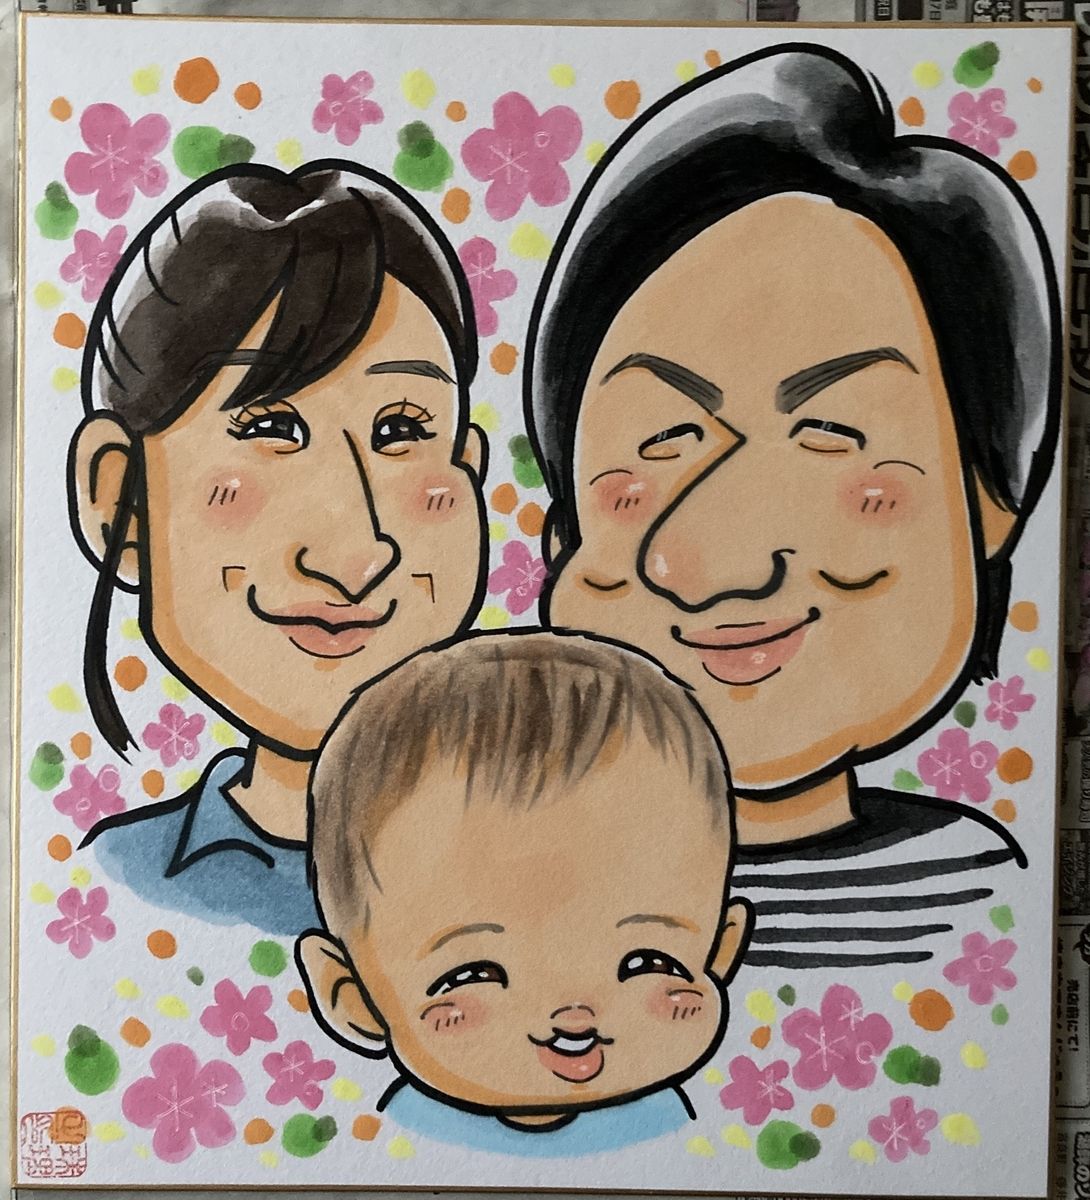 家族3人の似顔絵